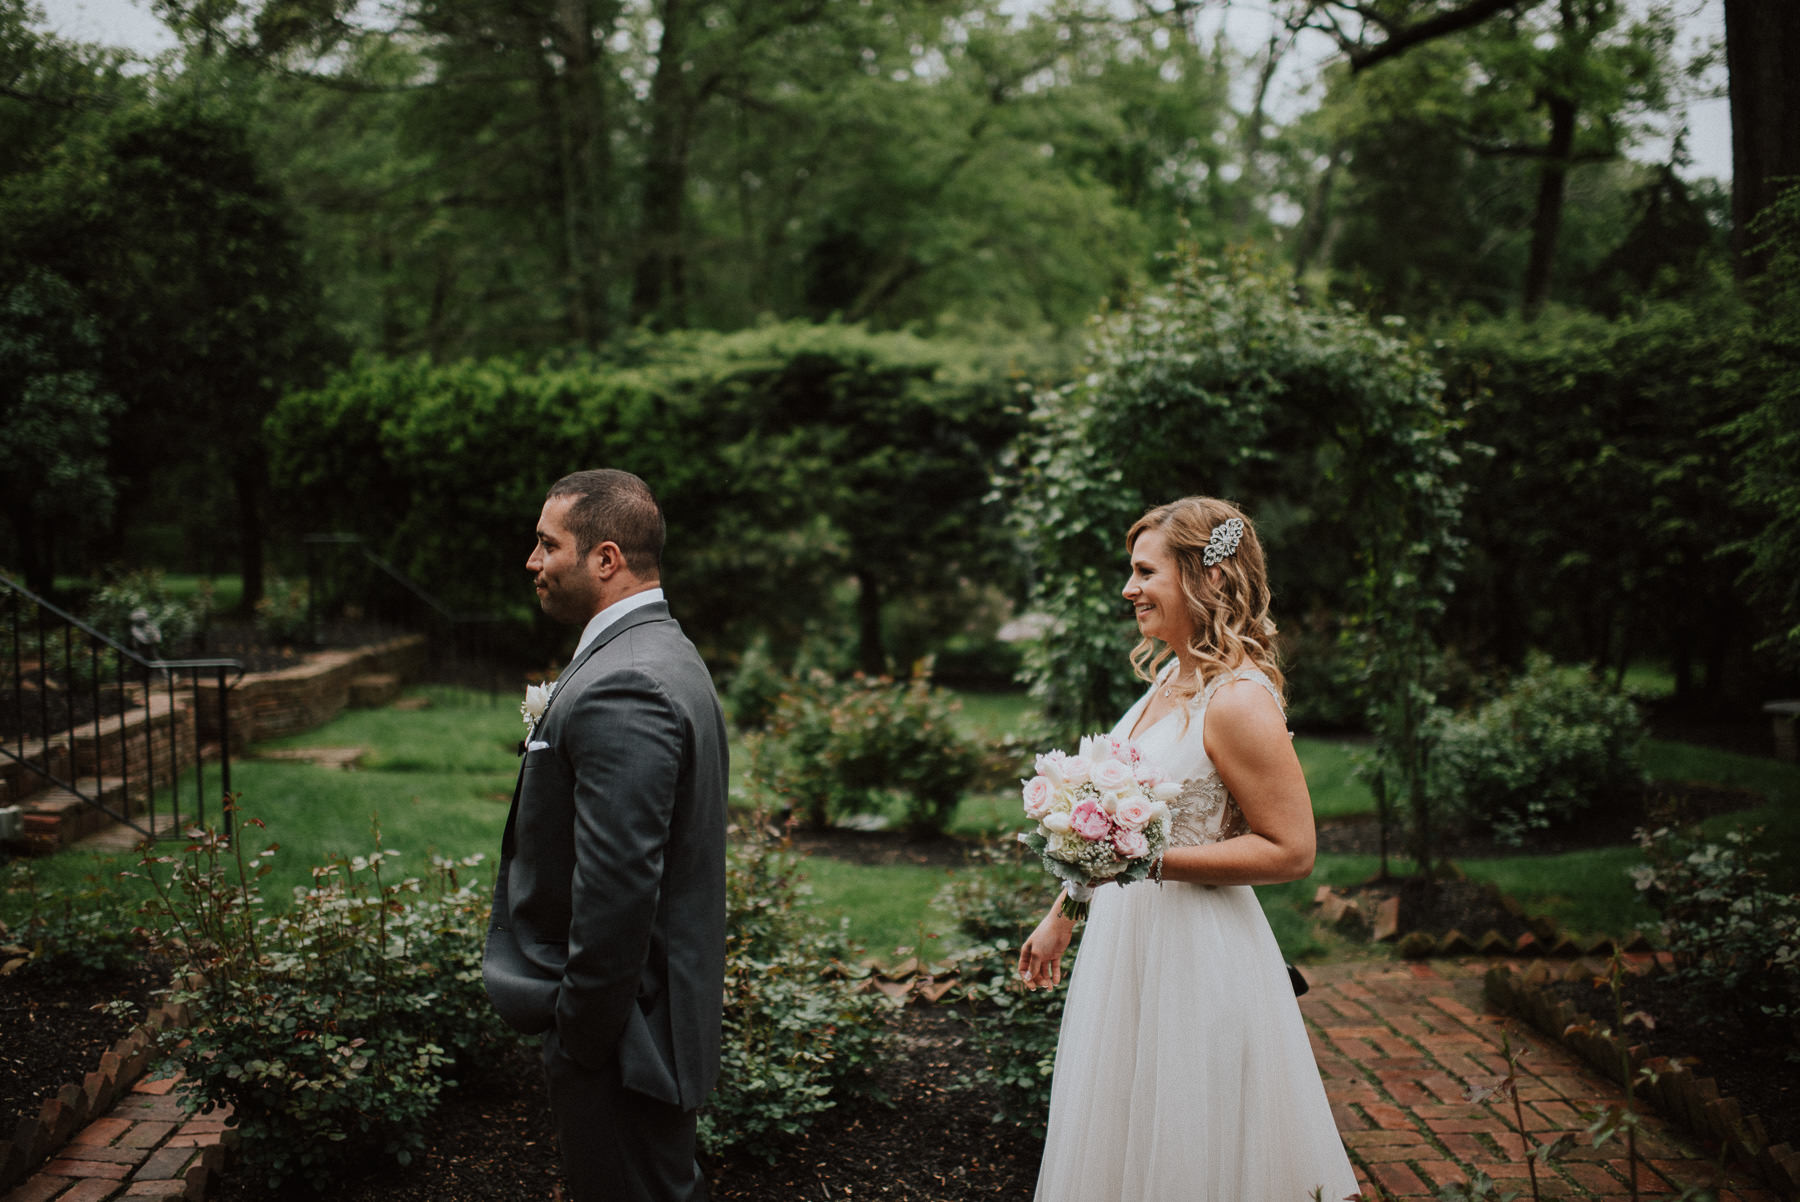 appleford-estate-wedding-photography-29.jpg